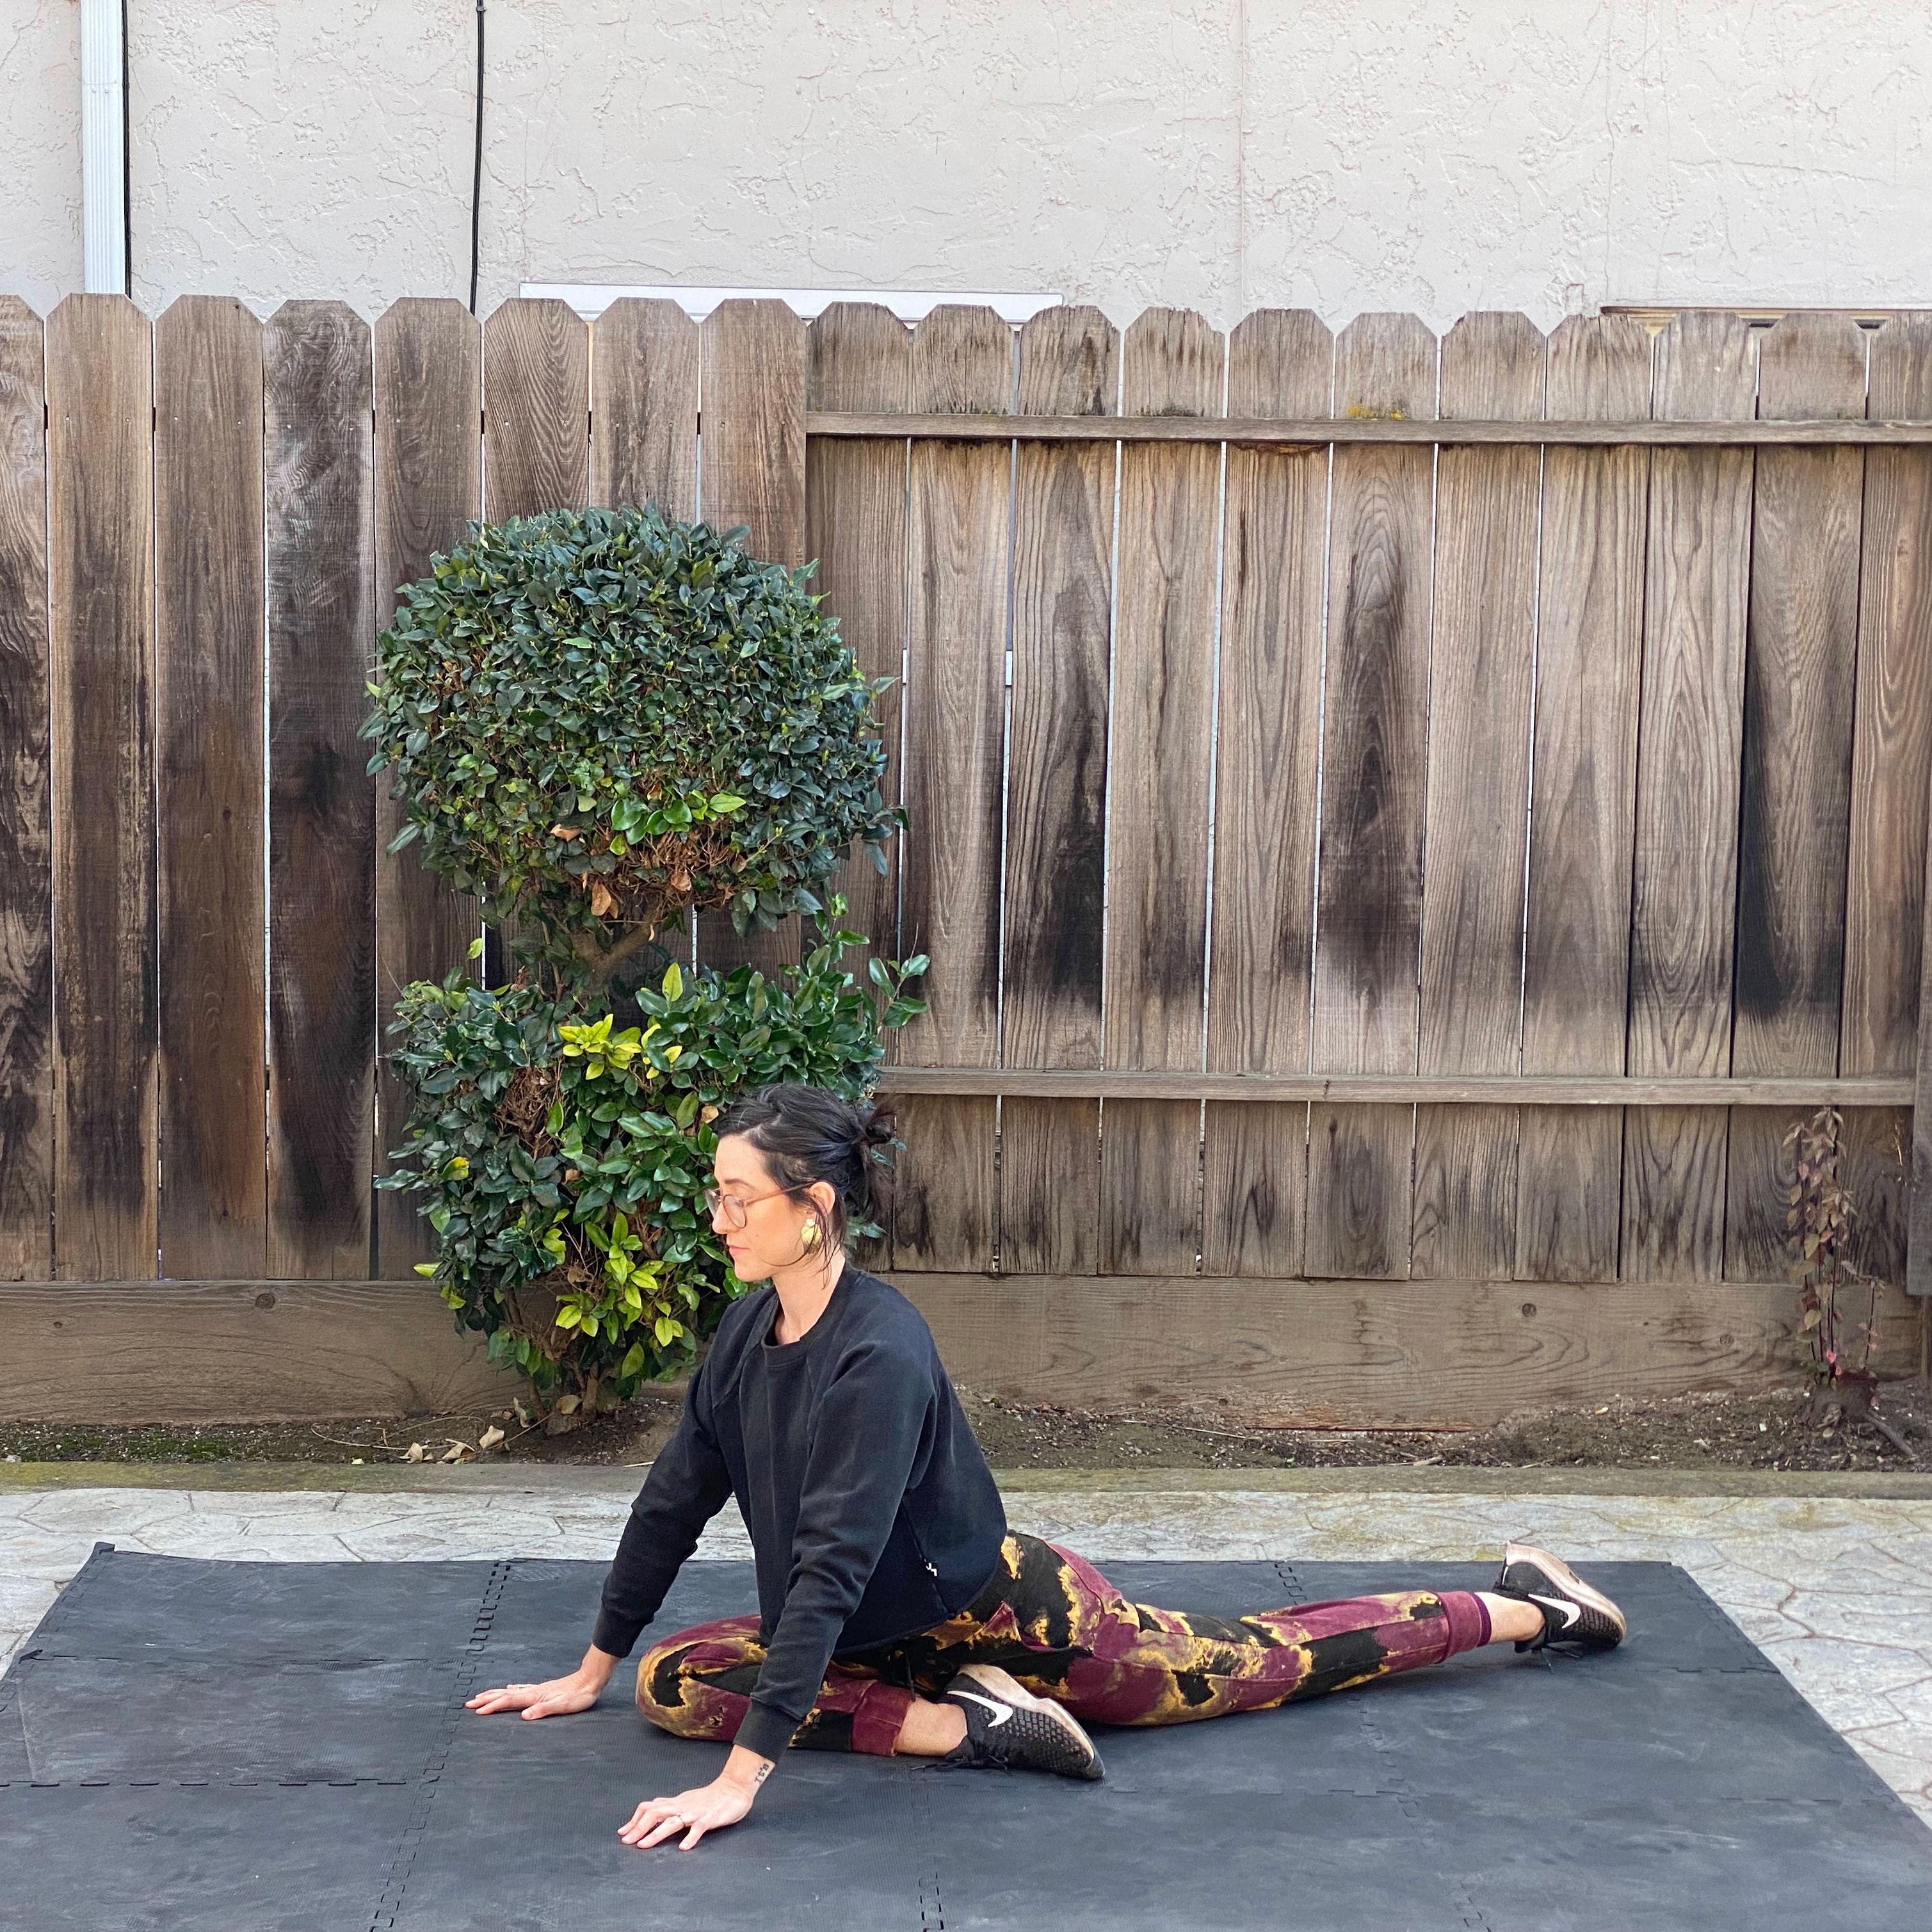 Varied-stance Endurance